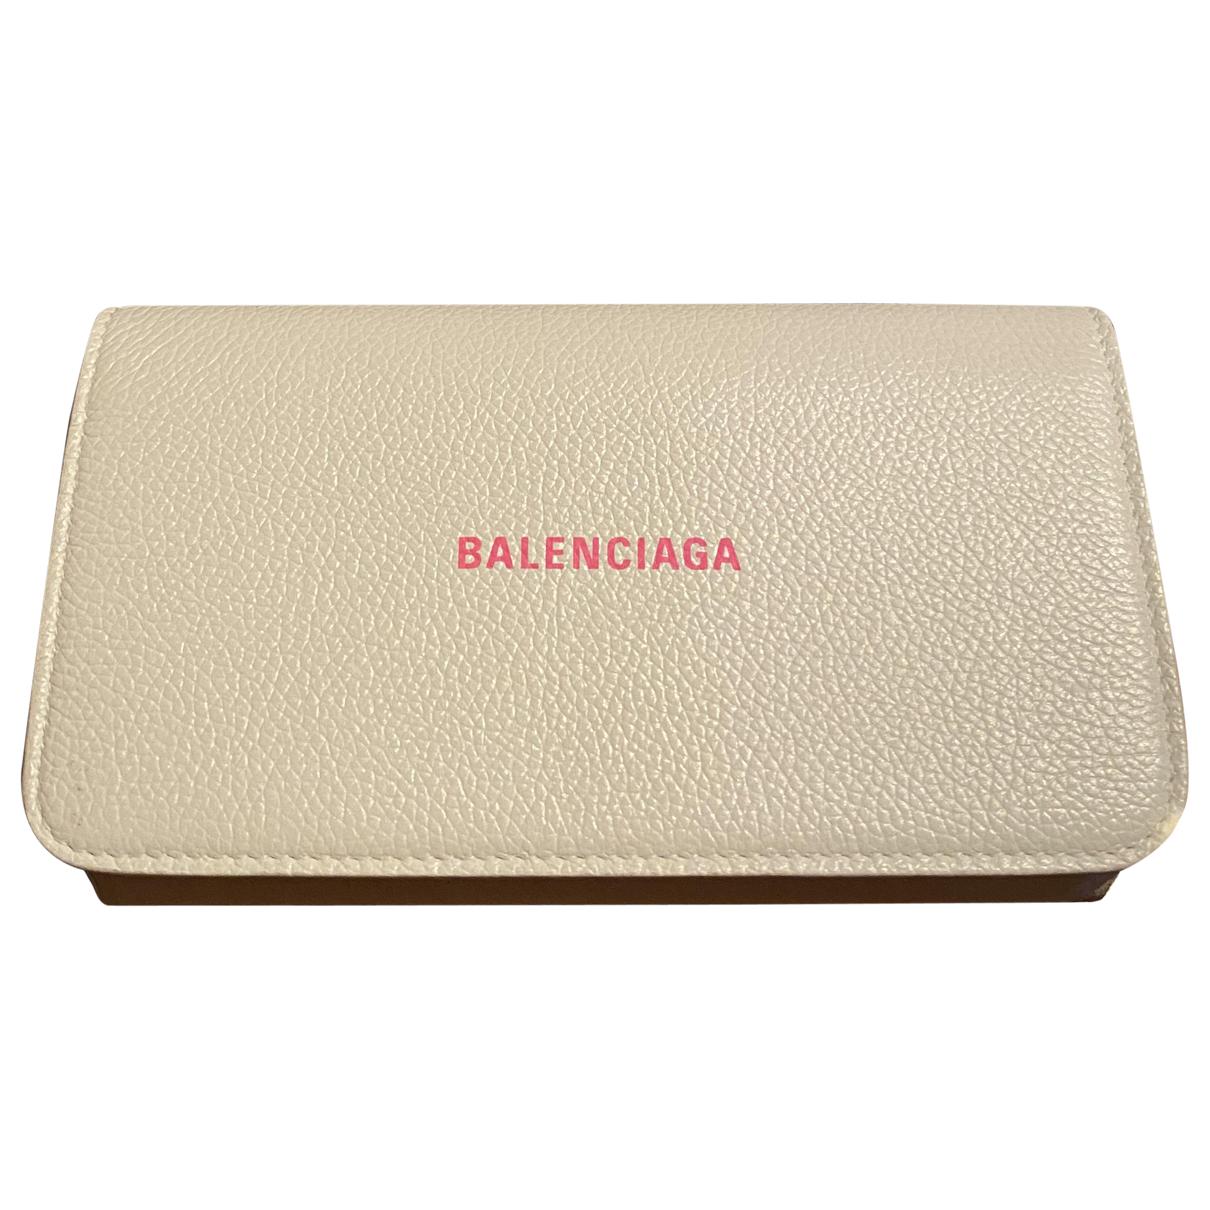 Balenciaga - Pochette Everyday pour femme en cuir - blanc